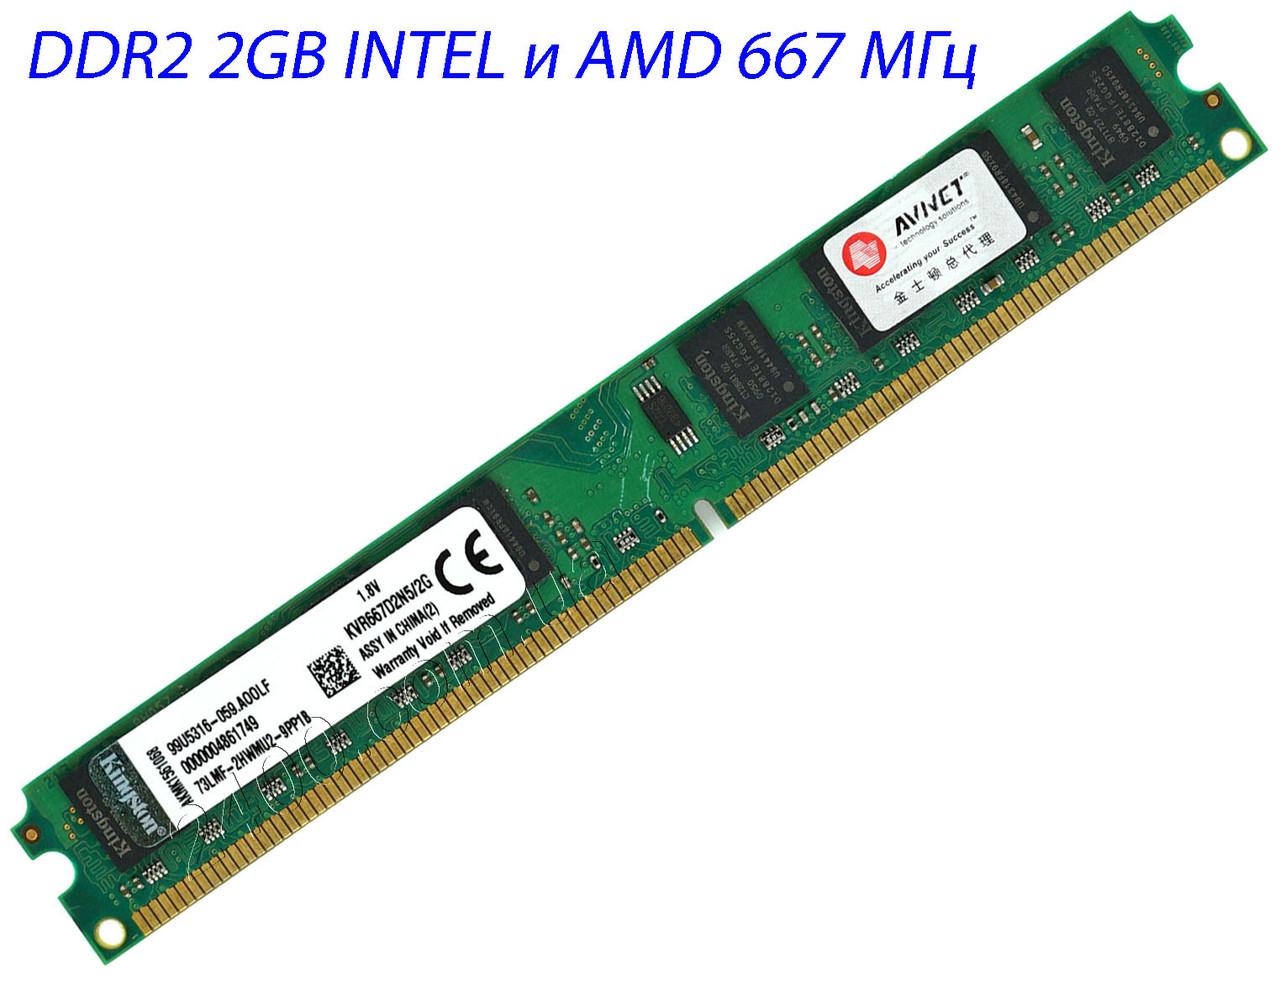 Оперативная память DDR2 2GB 667Mhz для INTEL и AMD ПК PC2-5300